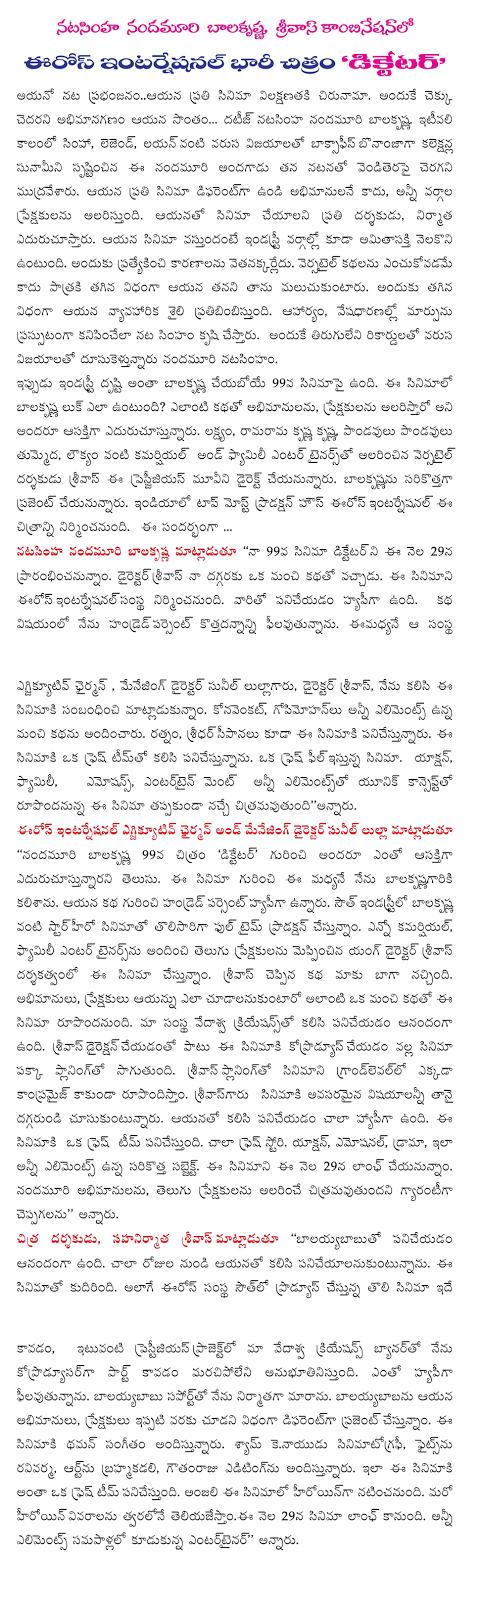 Balakrishna Dictator Confirmed